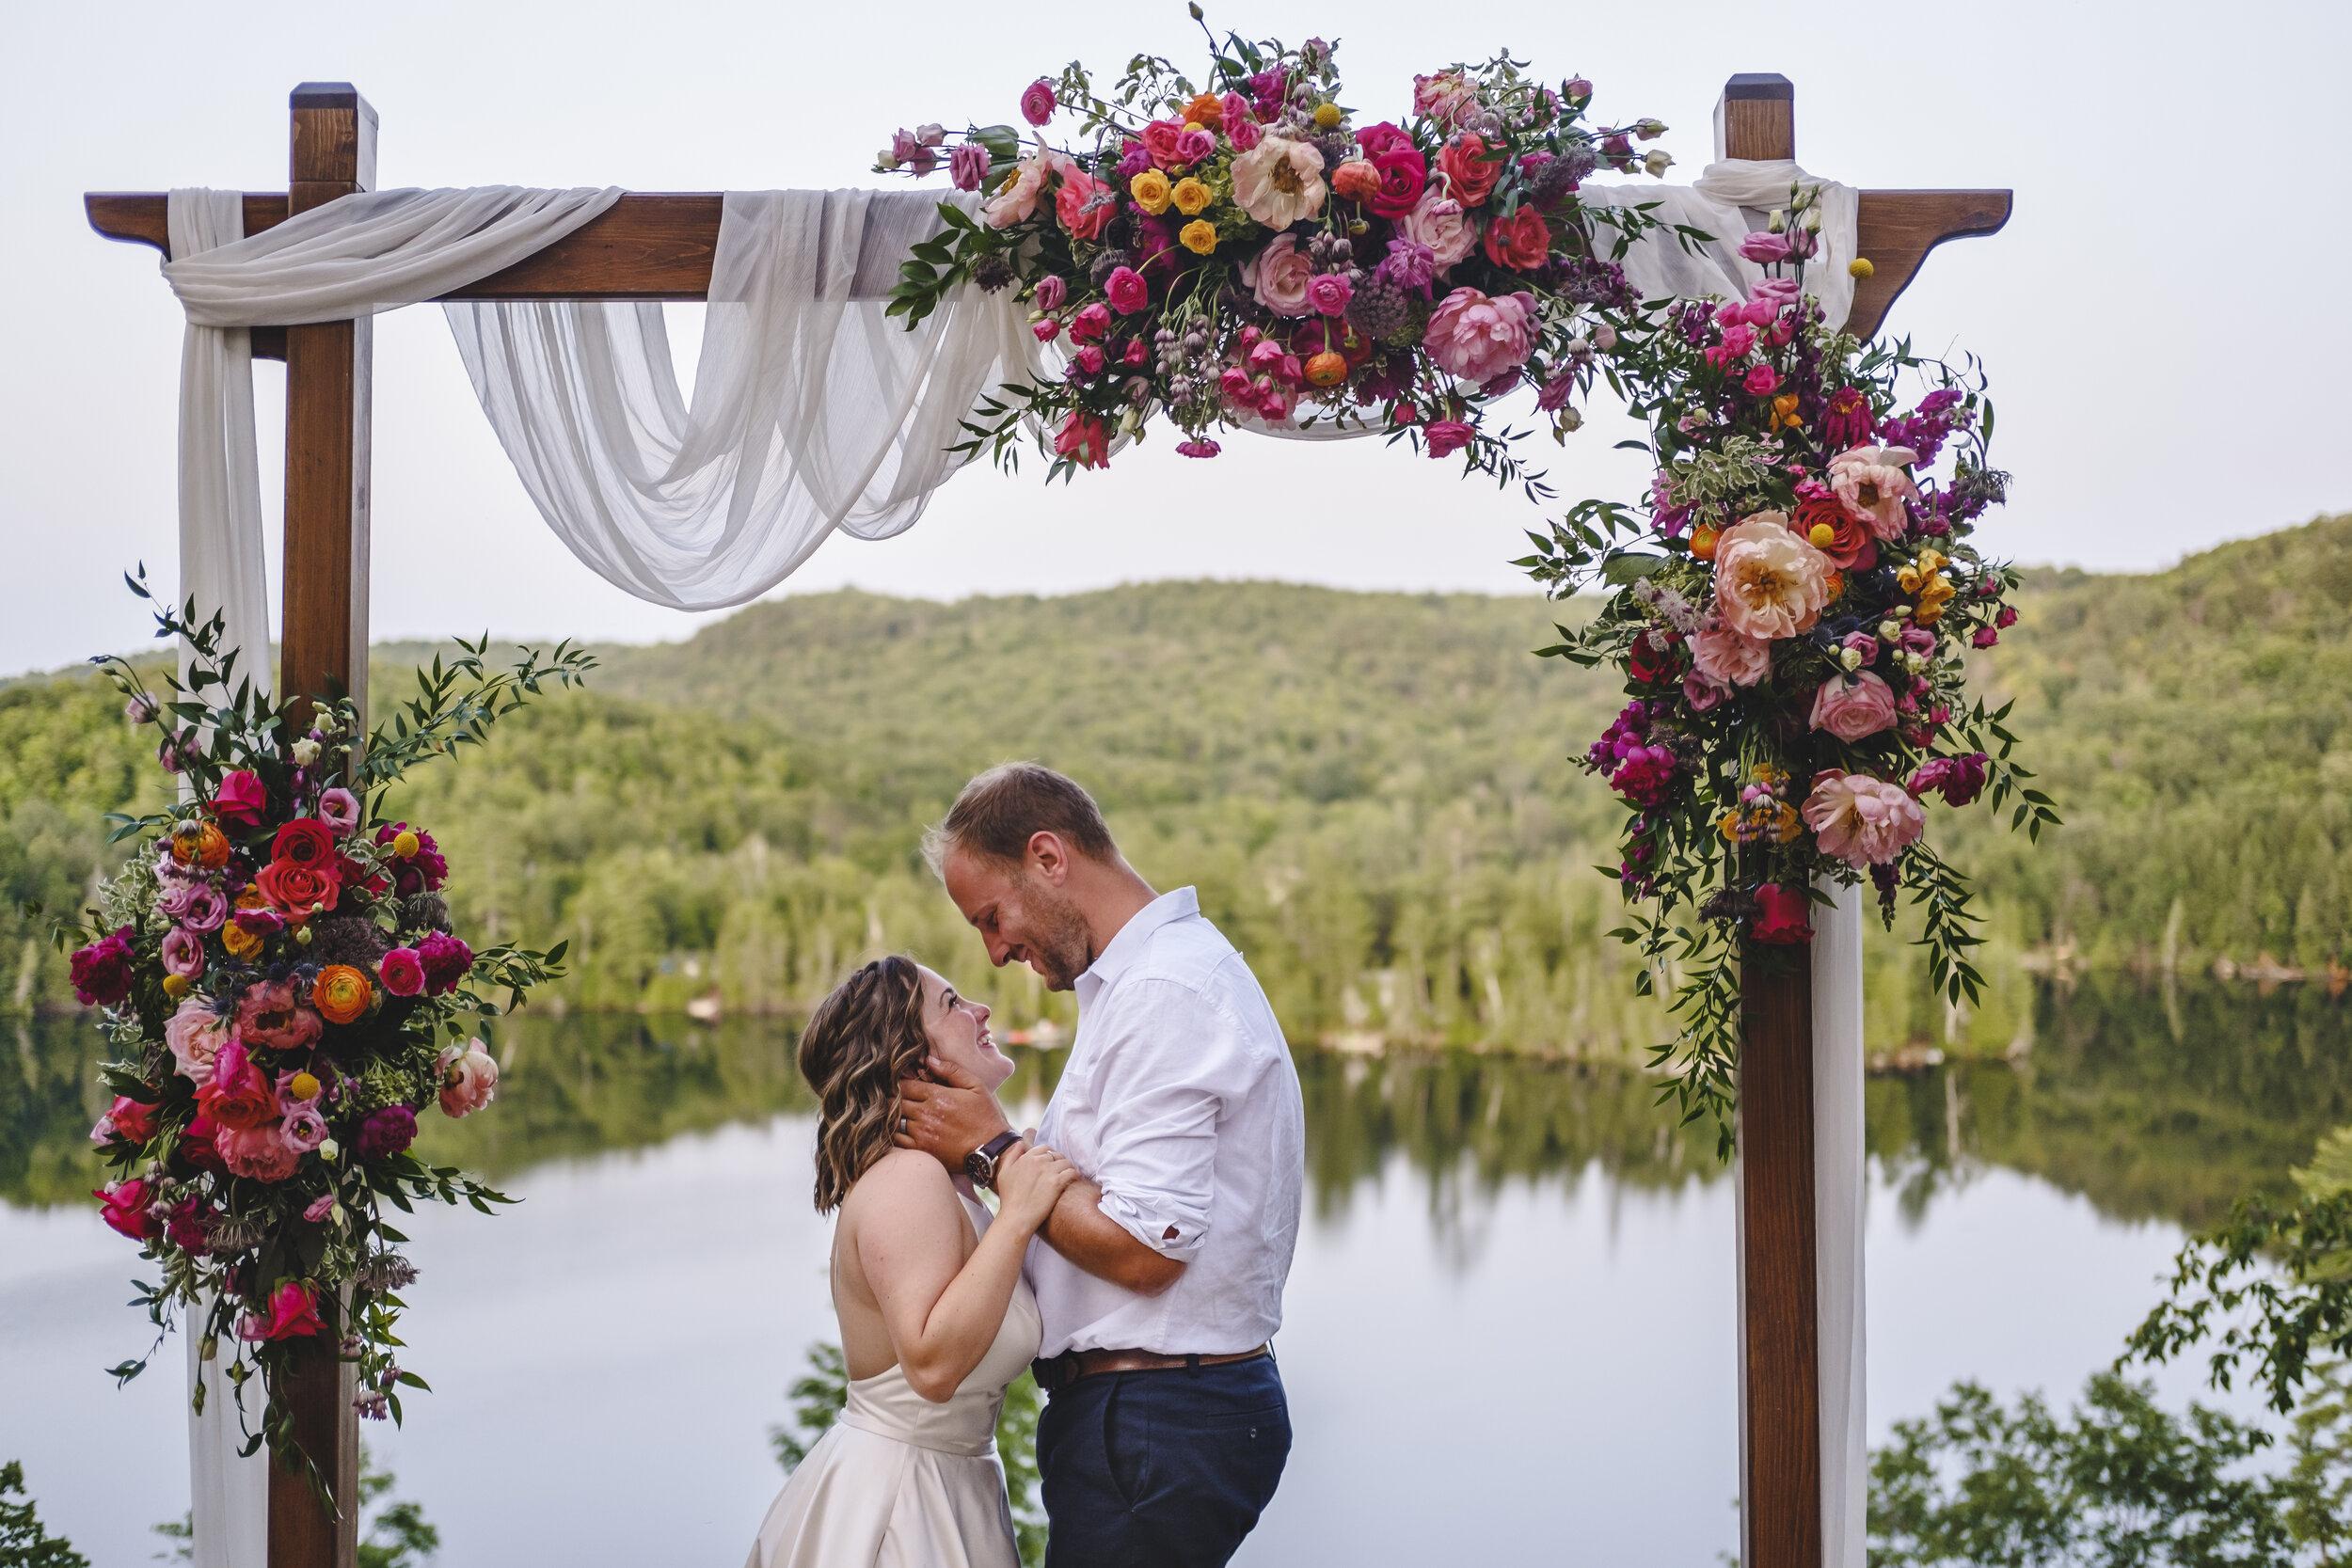 outdoor wedding ceremony photograph